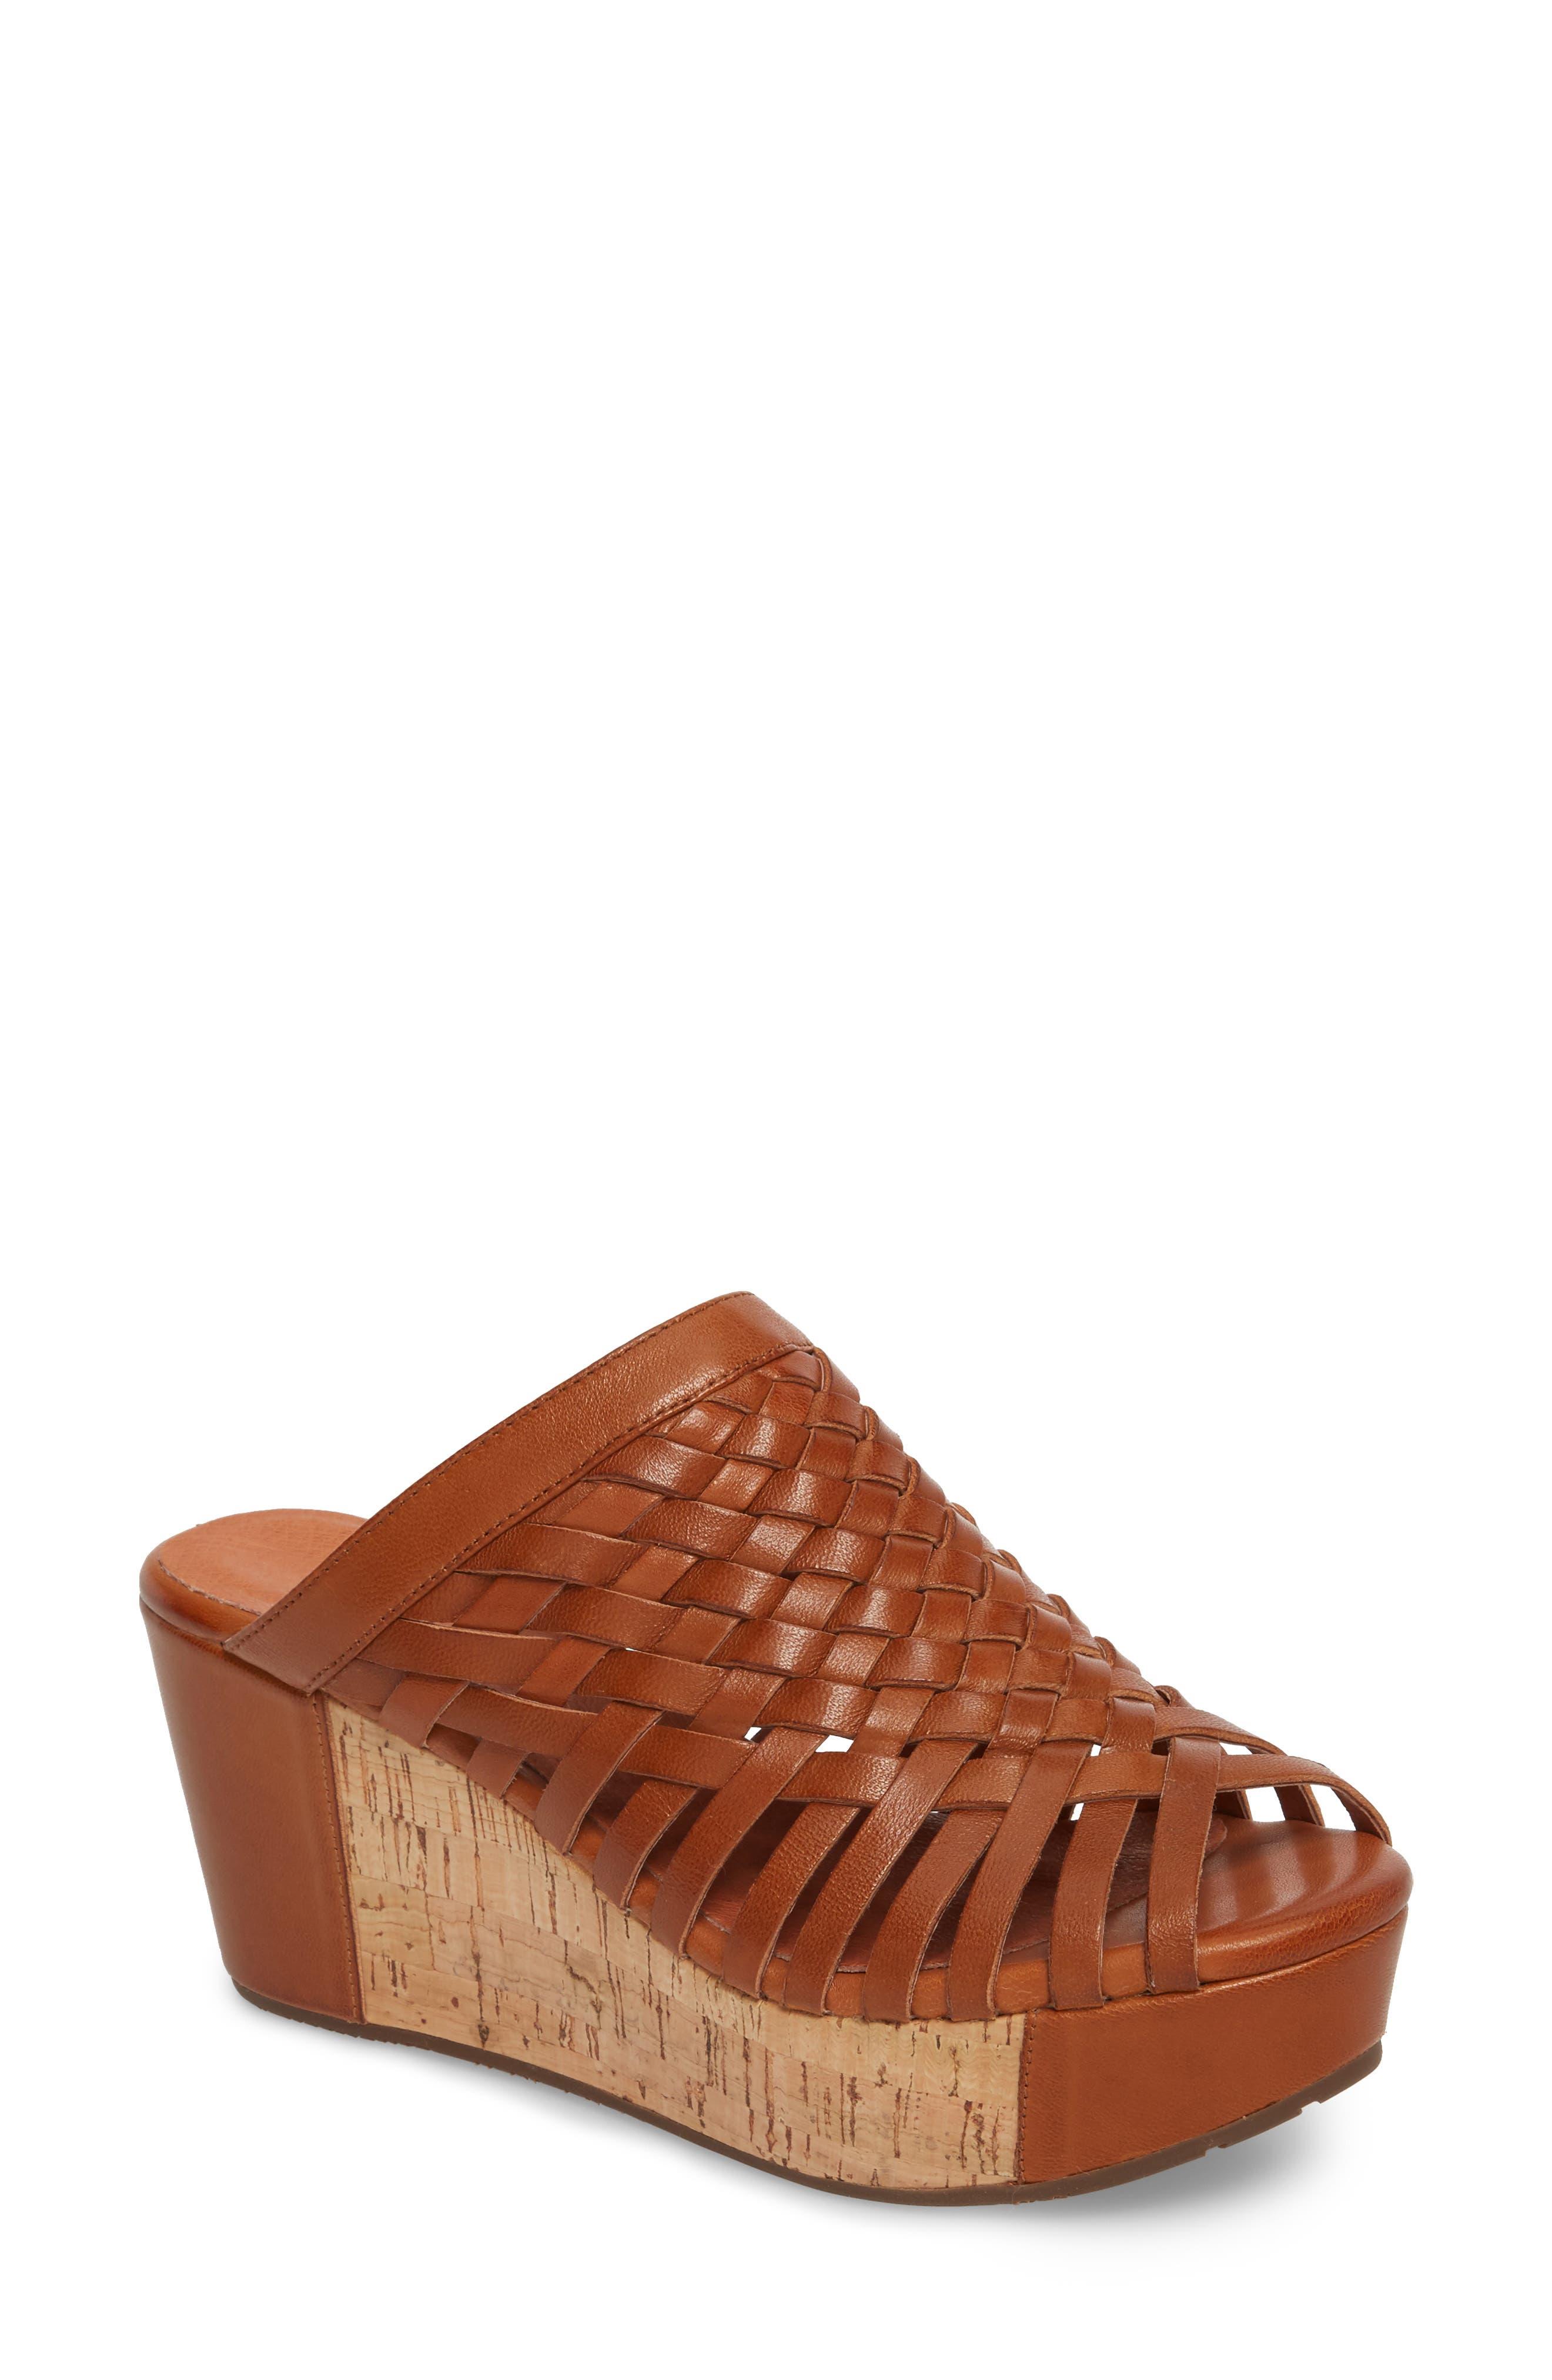 Walda Platform Wedge Sandal